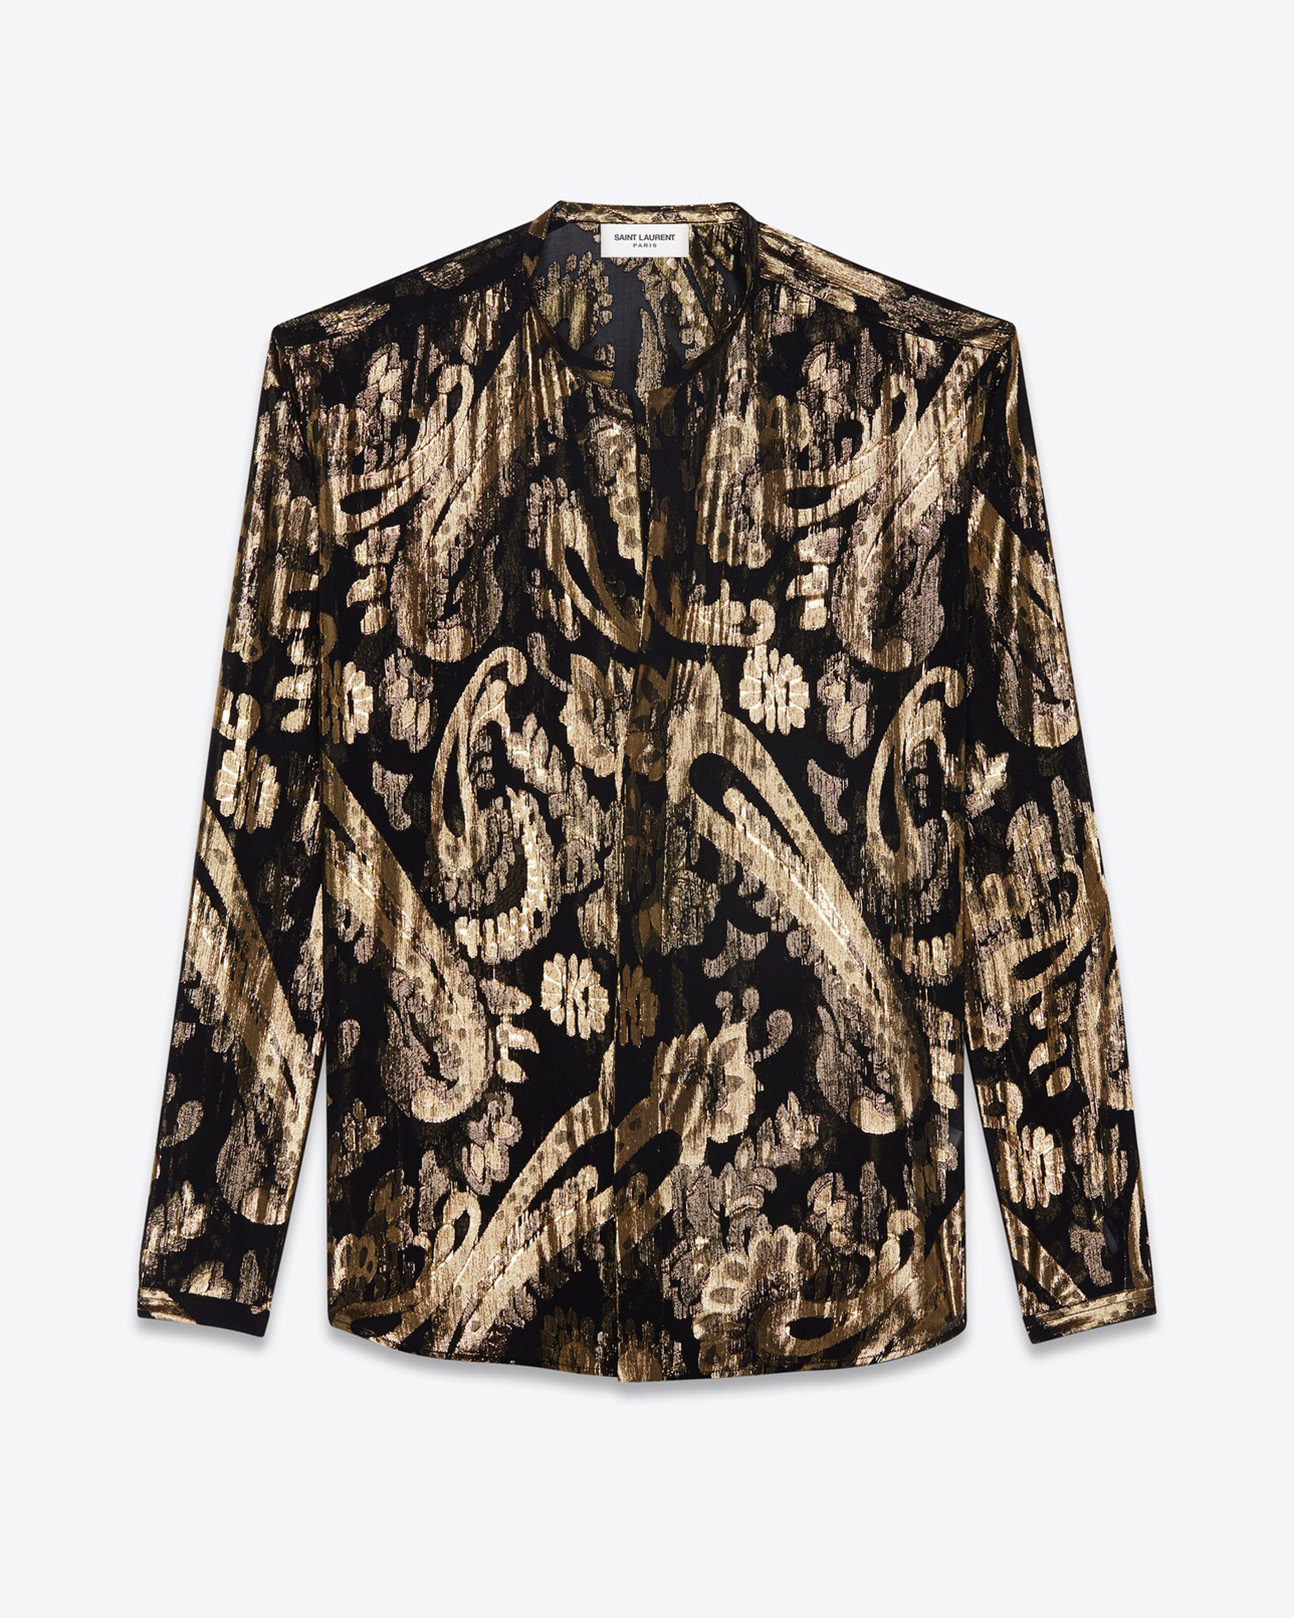 Saint Laurent Tunisian Collar Shirt In Black Silk With Gold Lamé Flowers